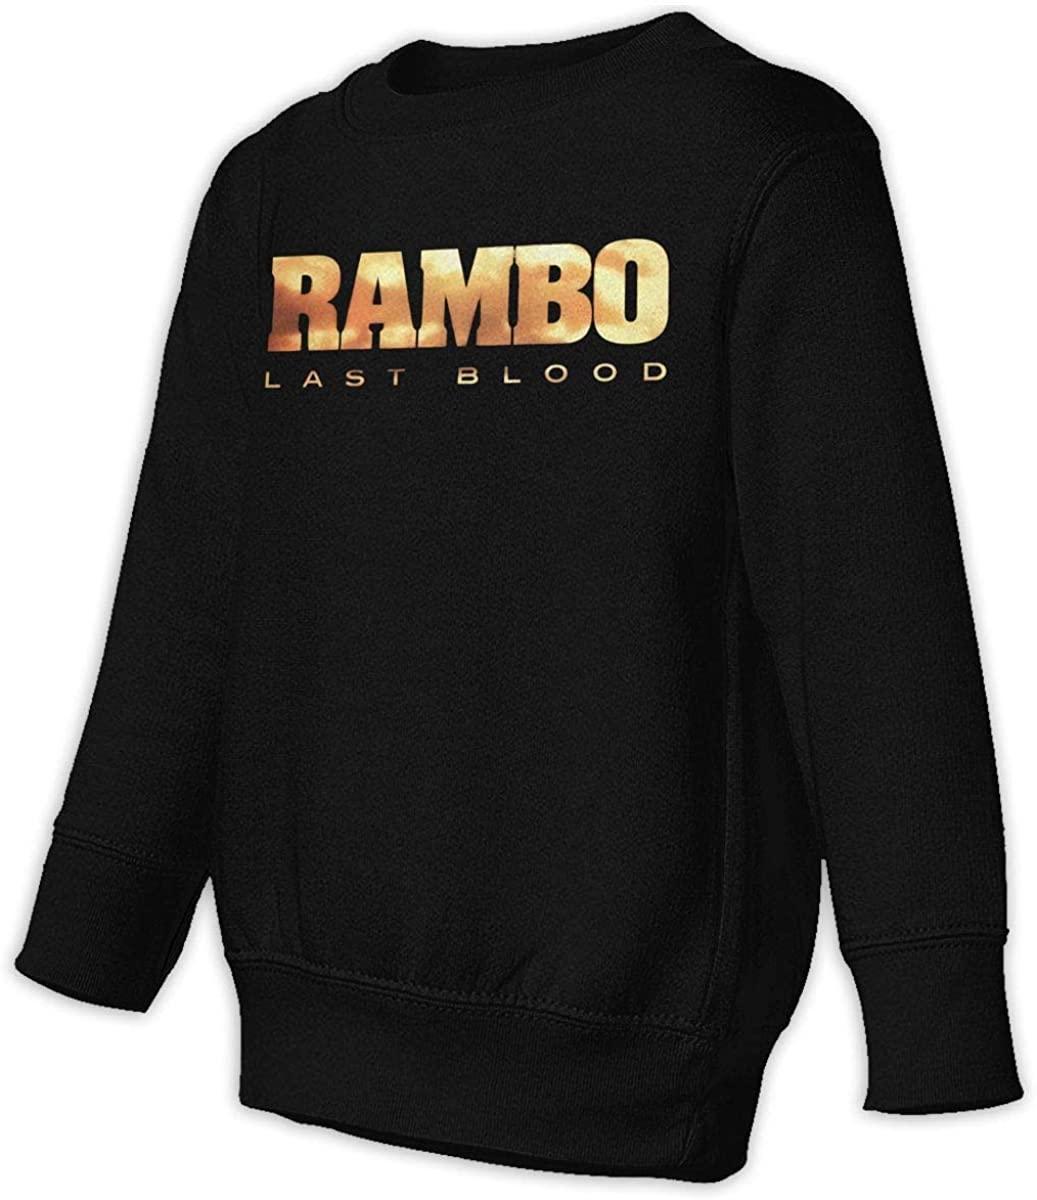 HUYAJGODGP-kiusdm Rambo Last Blood Unisex Sweatshirt Youth Boy and Girls Pullover Sweatshirt Black